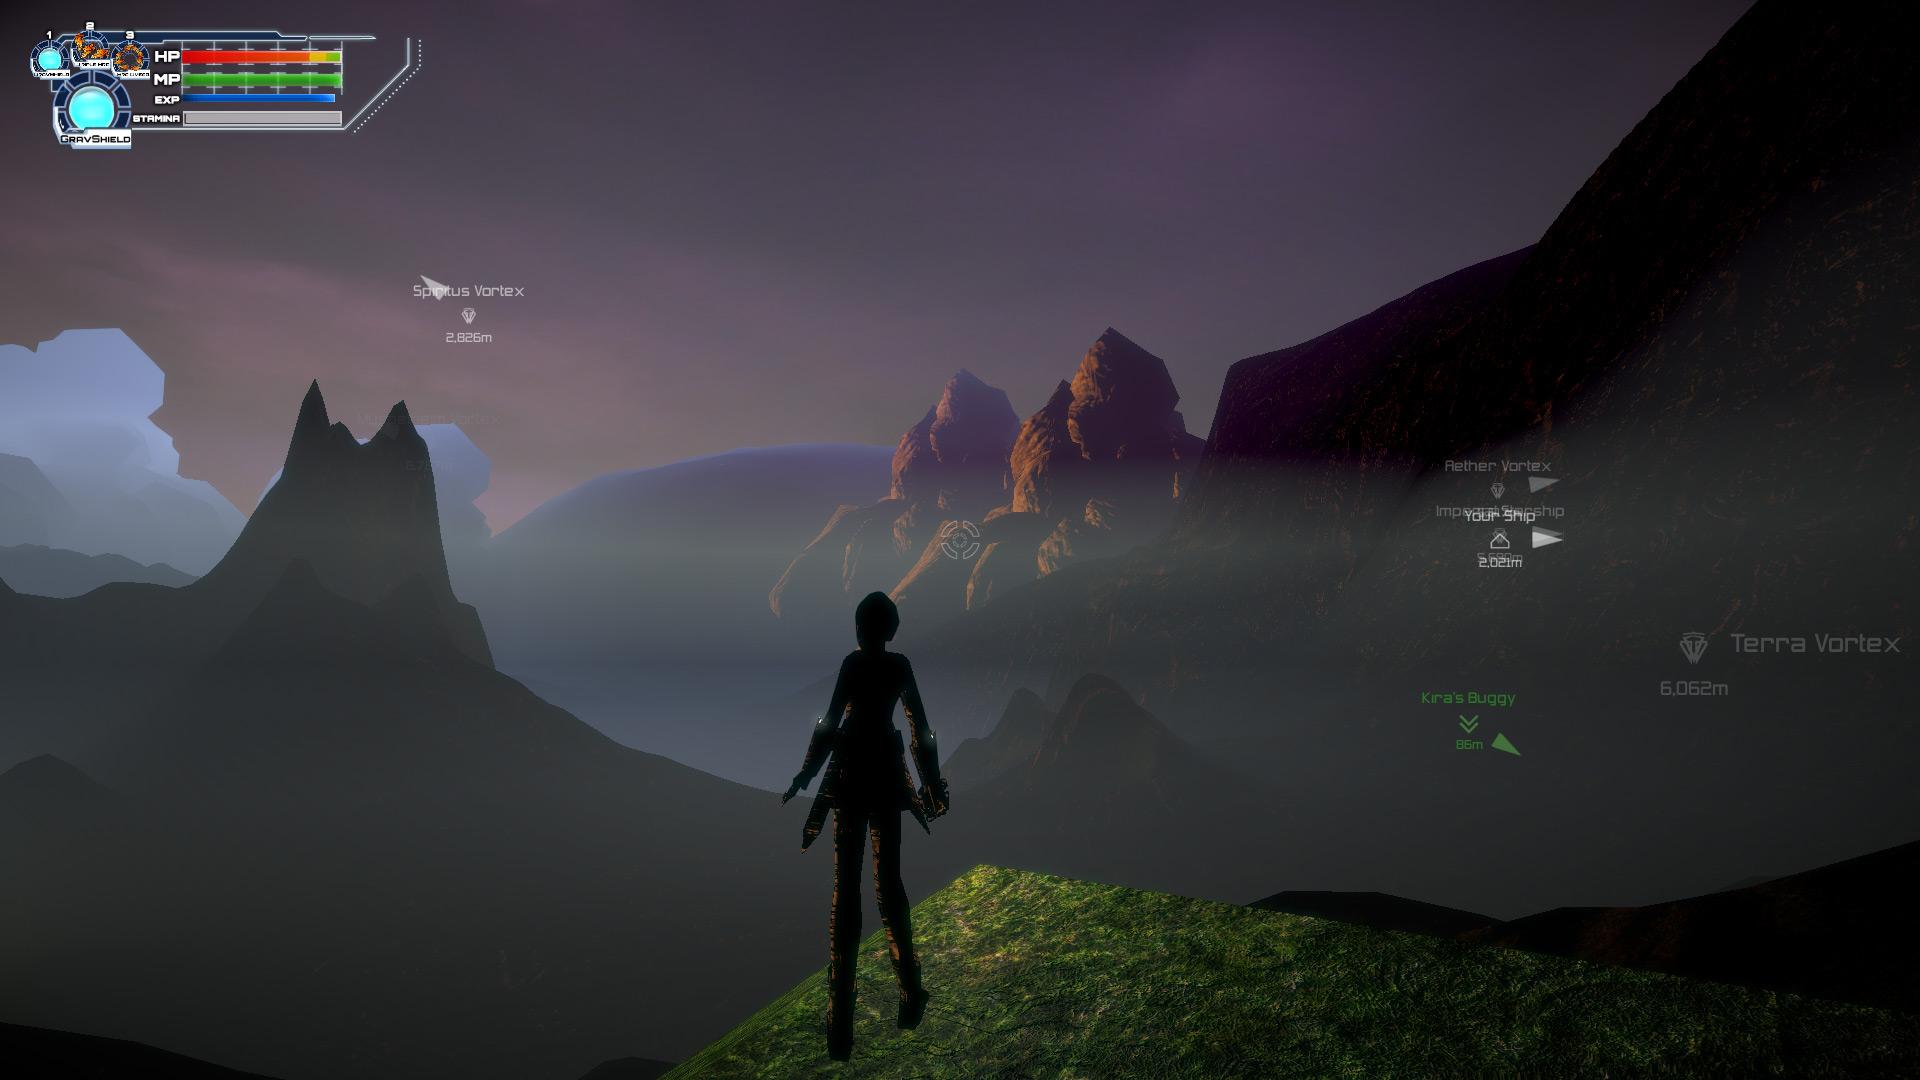 arcana kira alpha7 screenshot 04